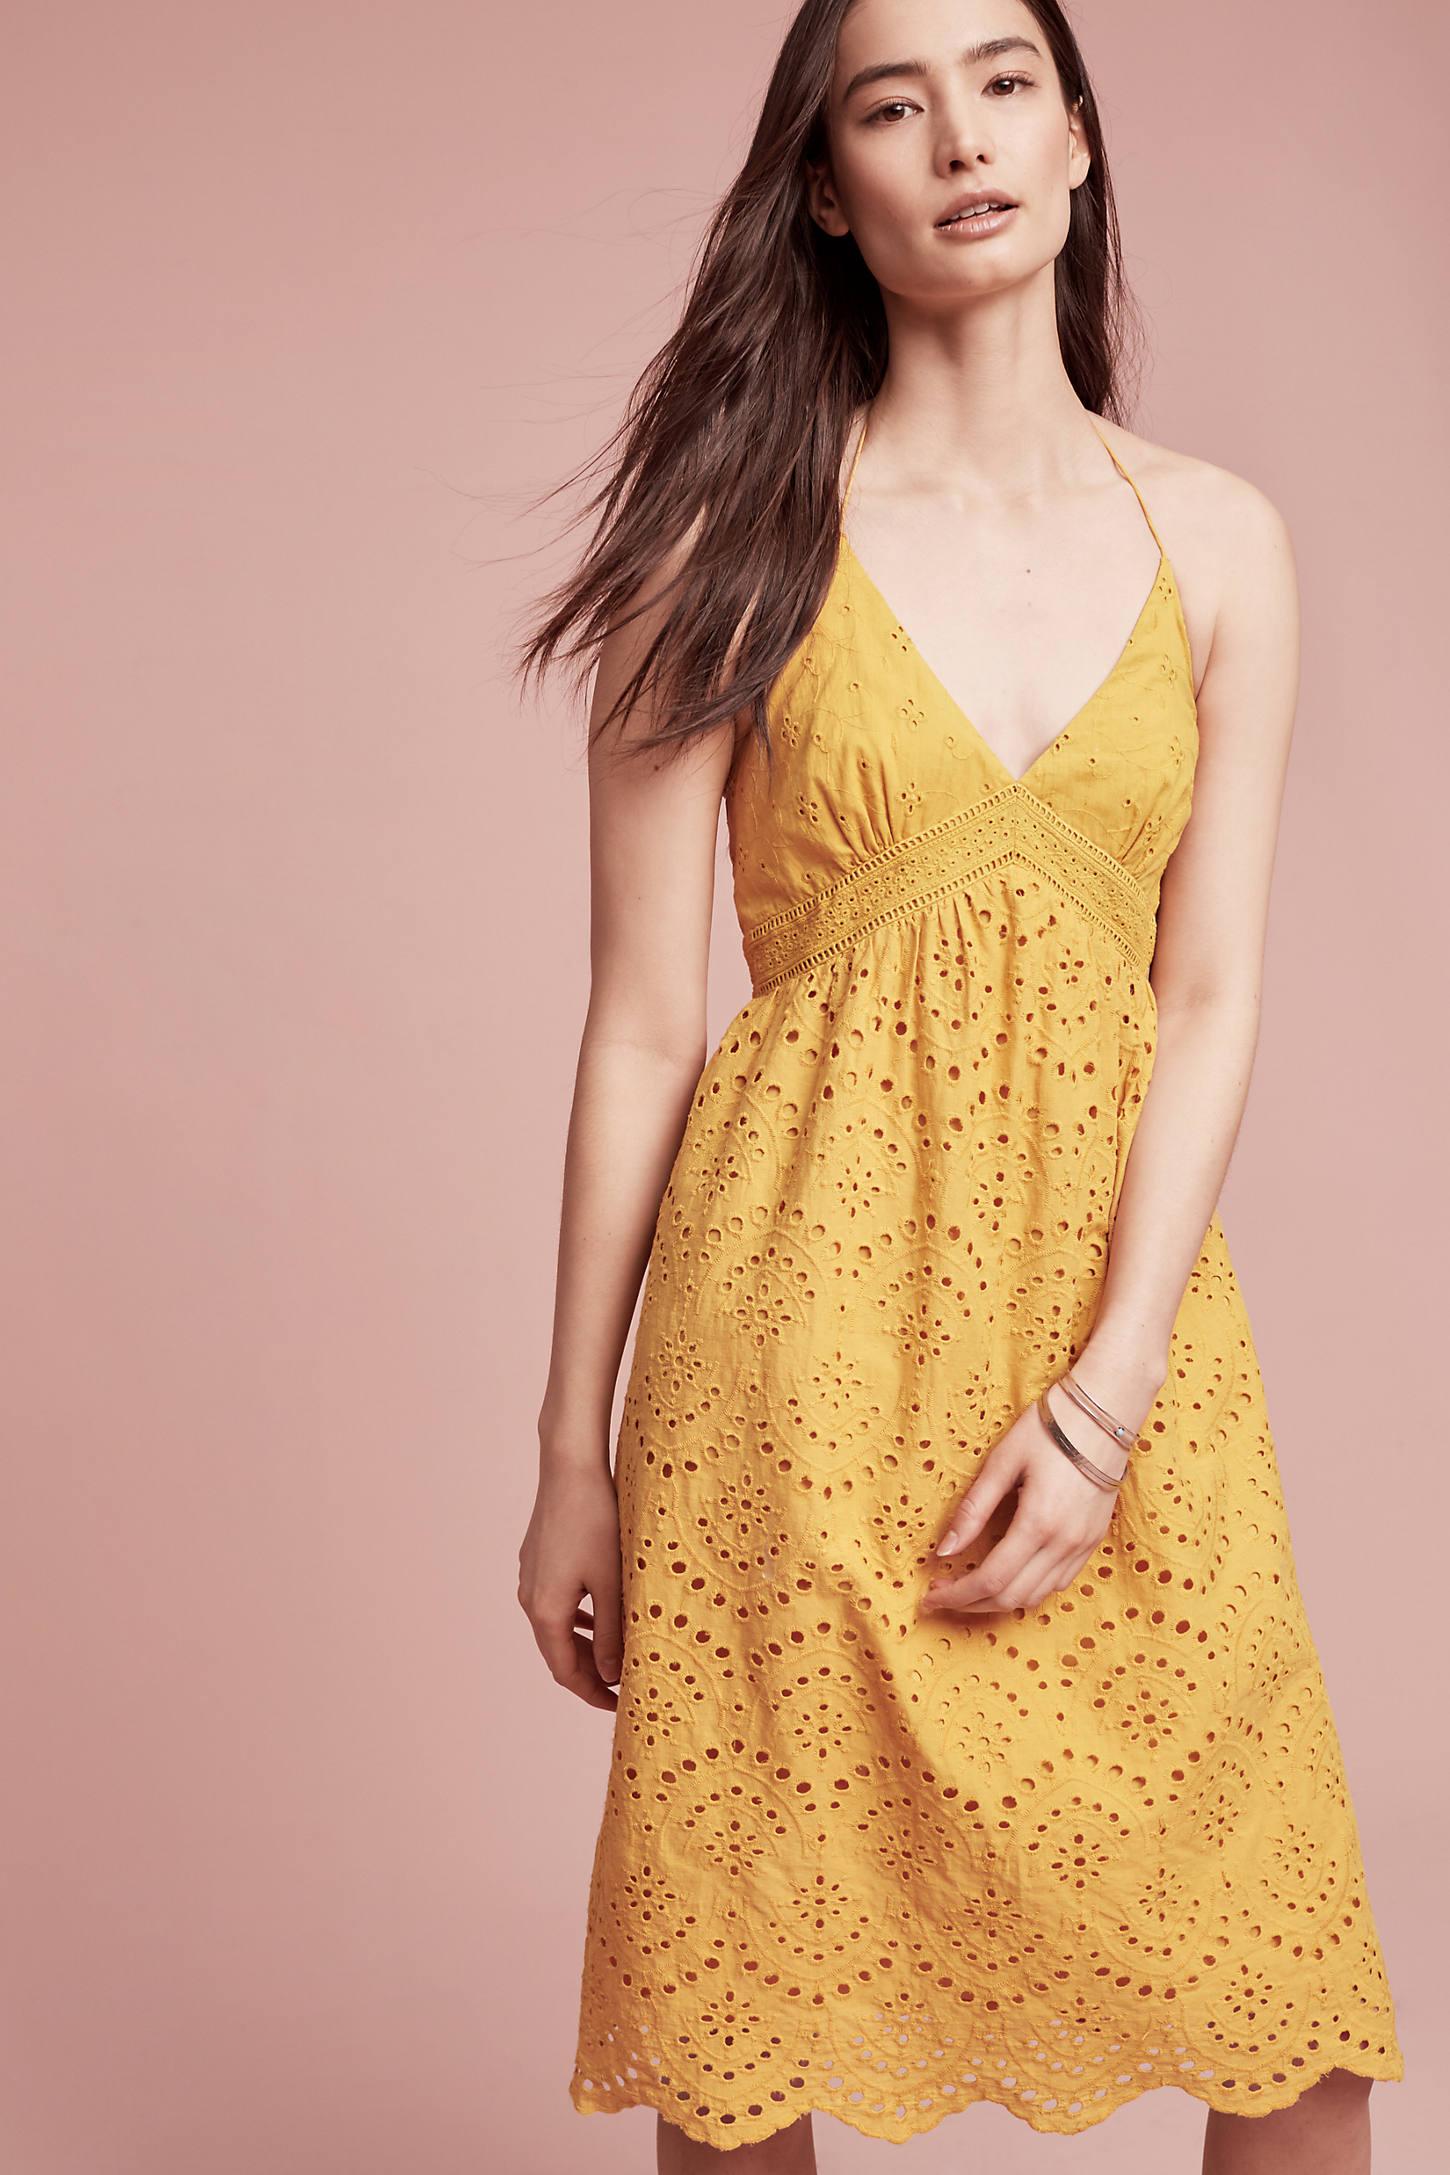 Buttercup Eyelet Dress